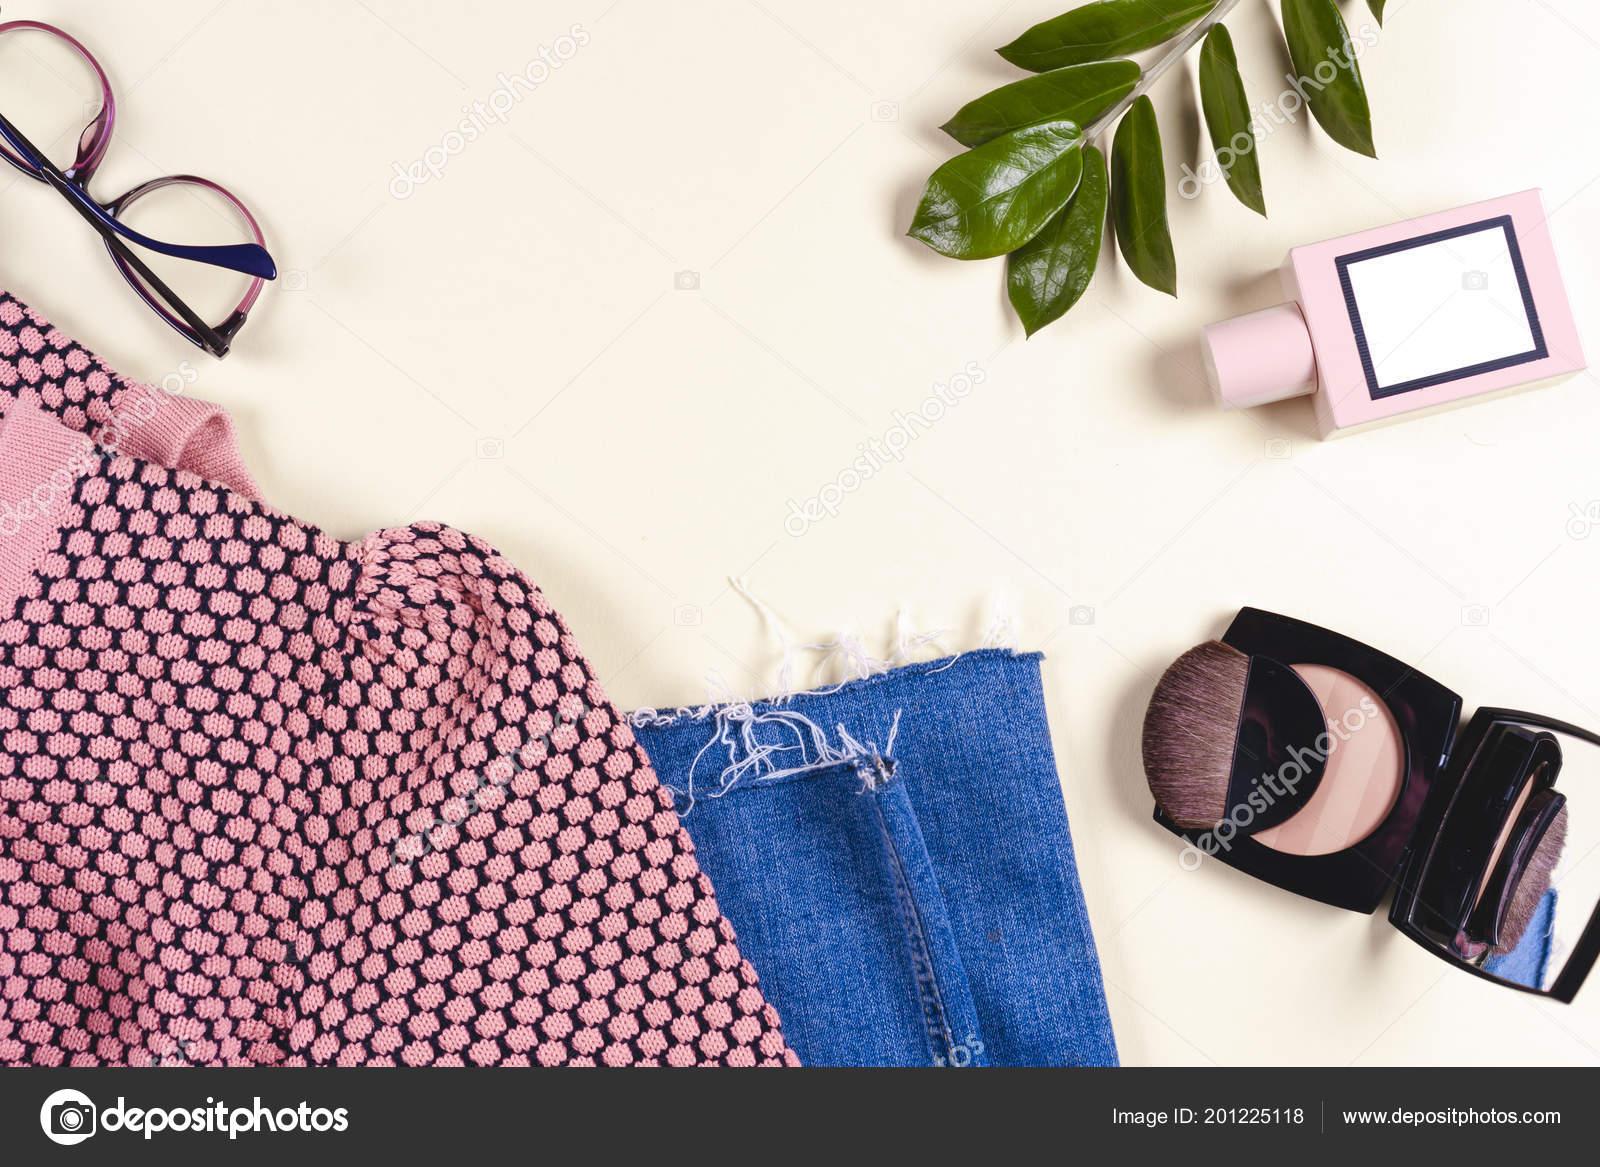 e1c21a41 Fashion Women Clothing Set Accessories Vanilla Pastel Colors Summer Street  — Stock Photo